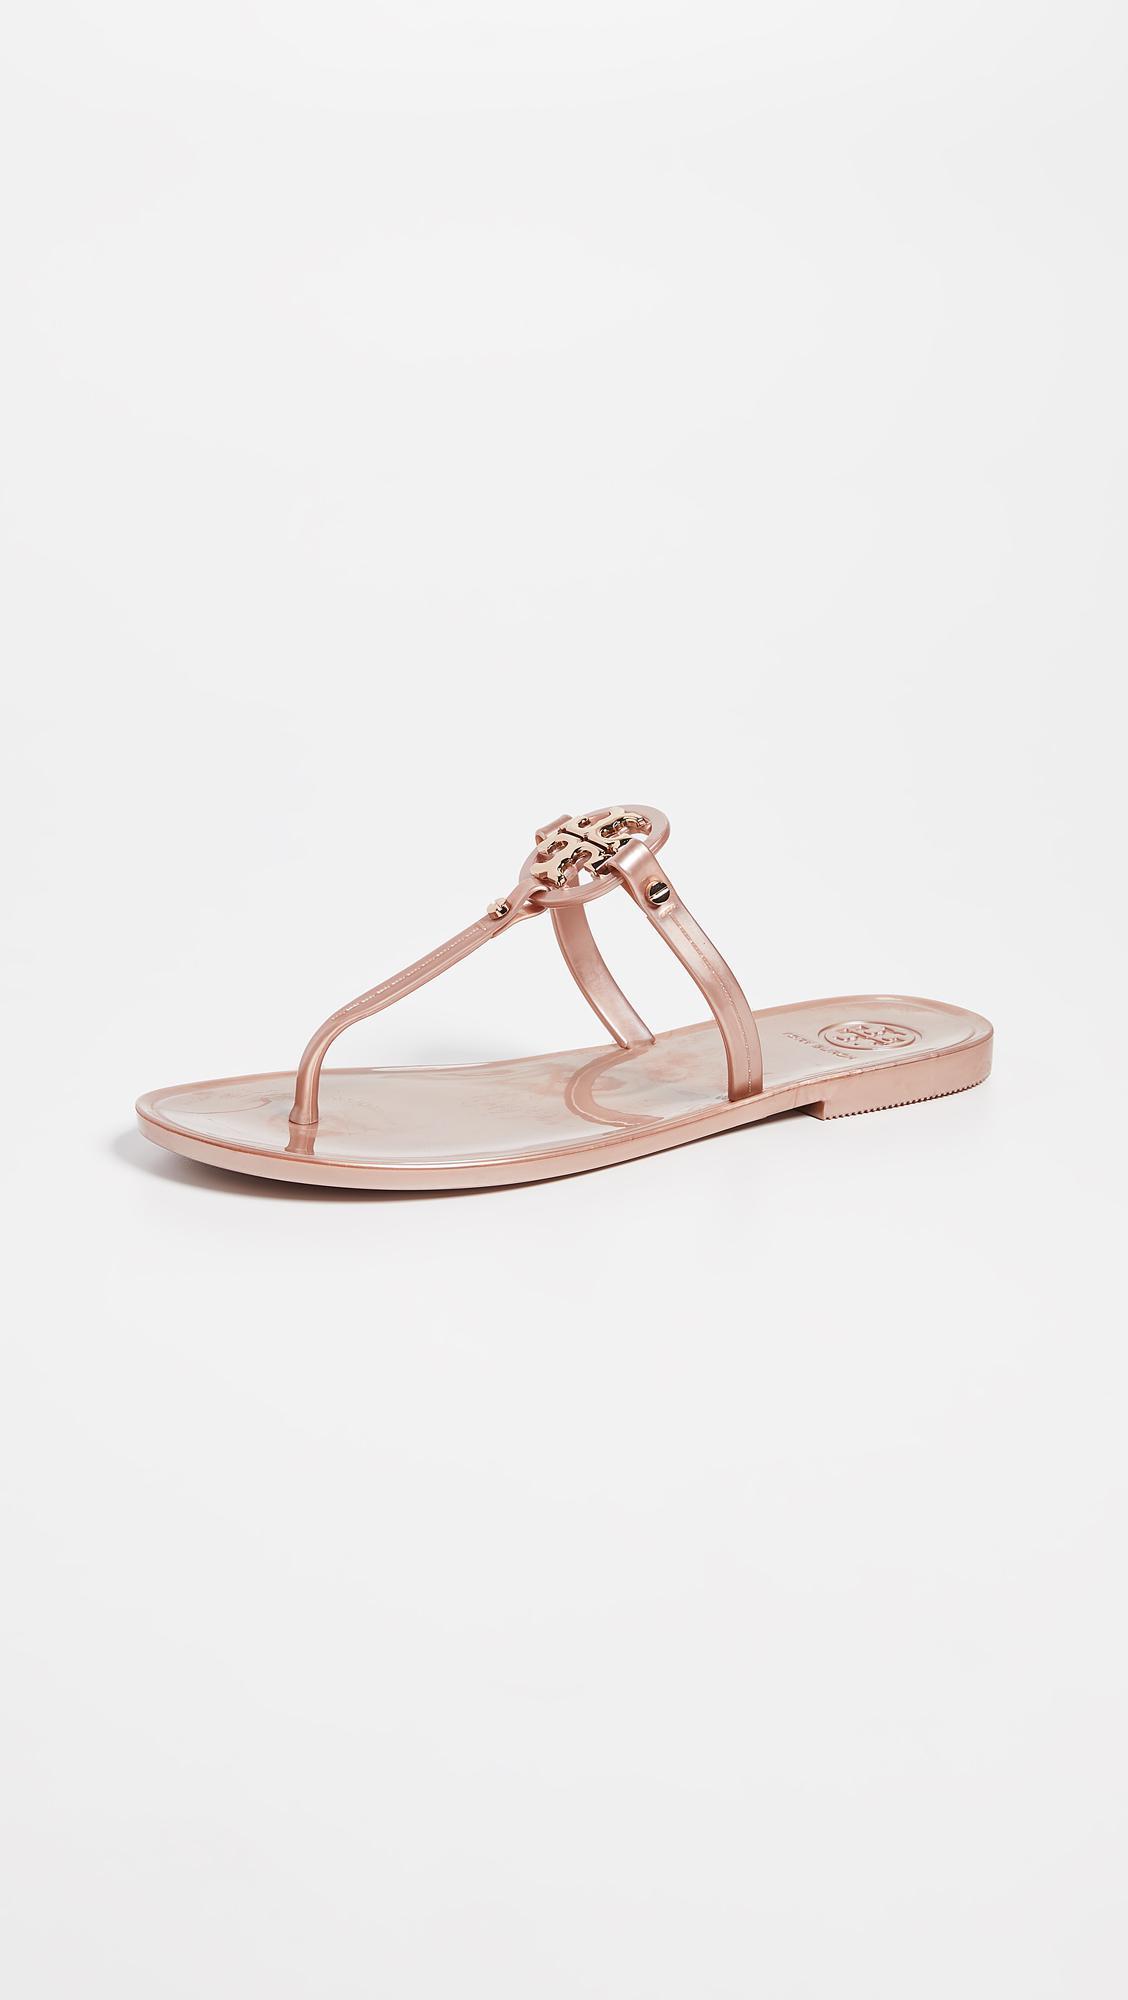 61761578069 Tory Burch Mini Miller Flat Thong Sandals in Pink - Lyst